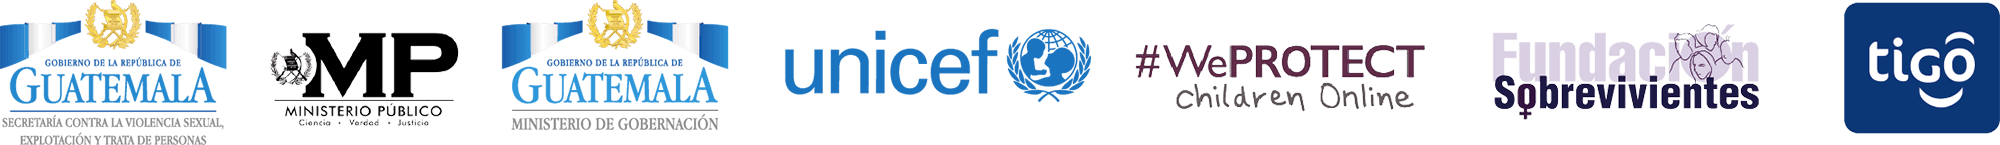 logos_unicef